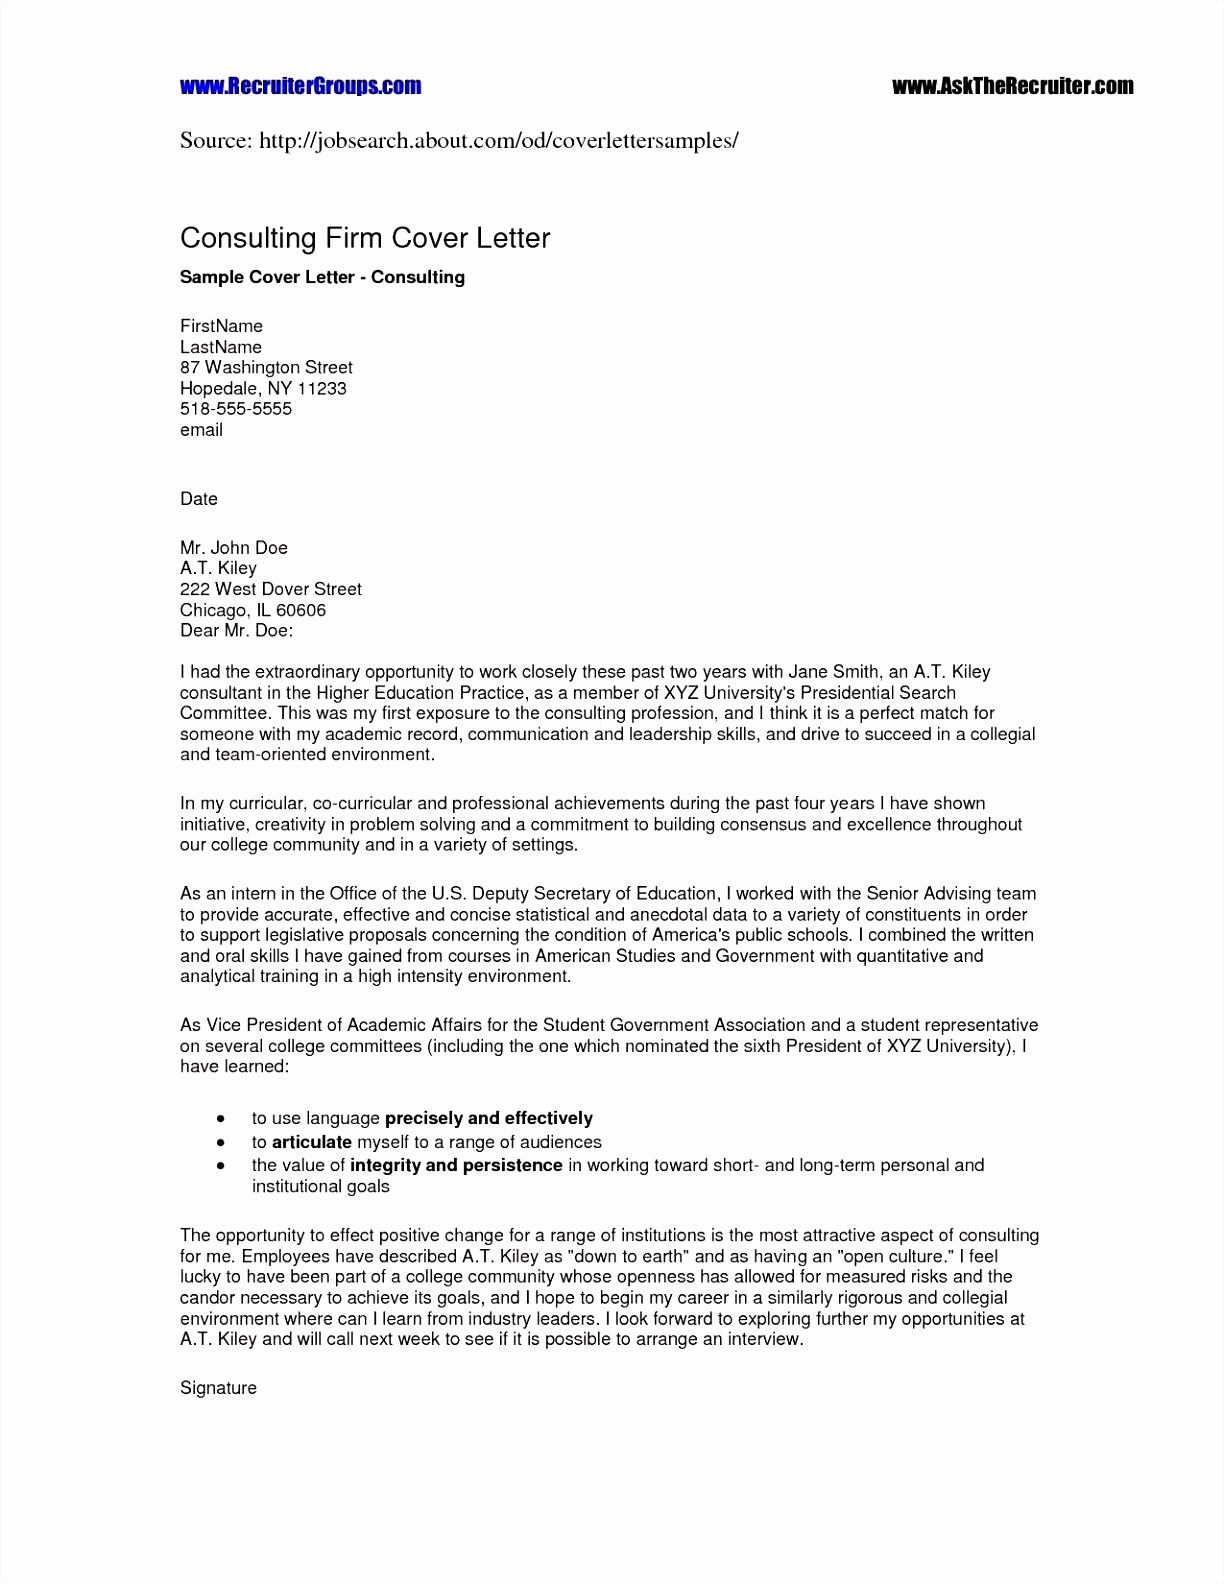 Certificate pliance form Template Luxury Portfolio